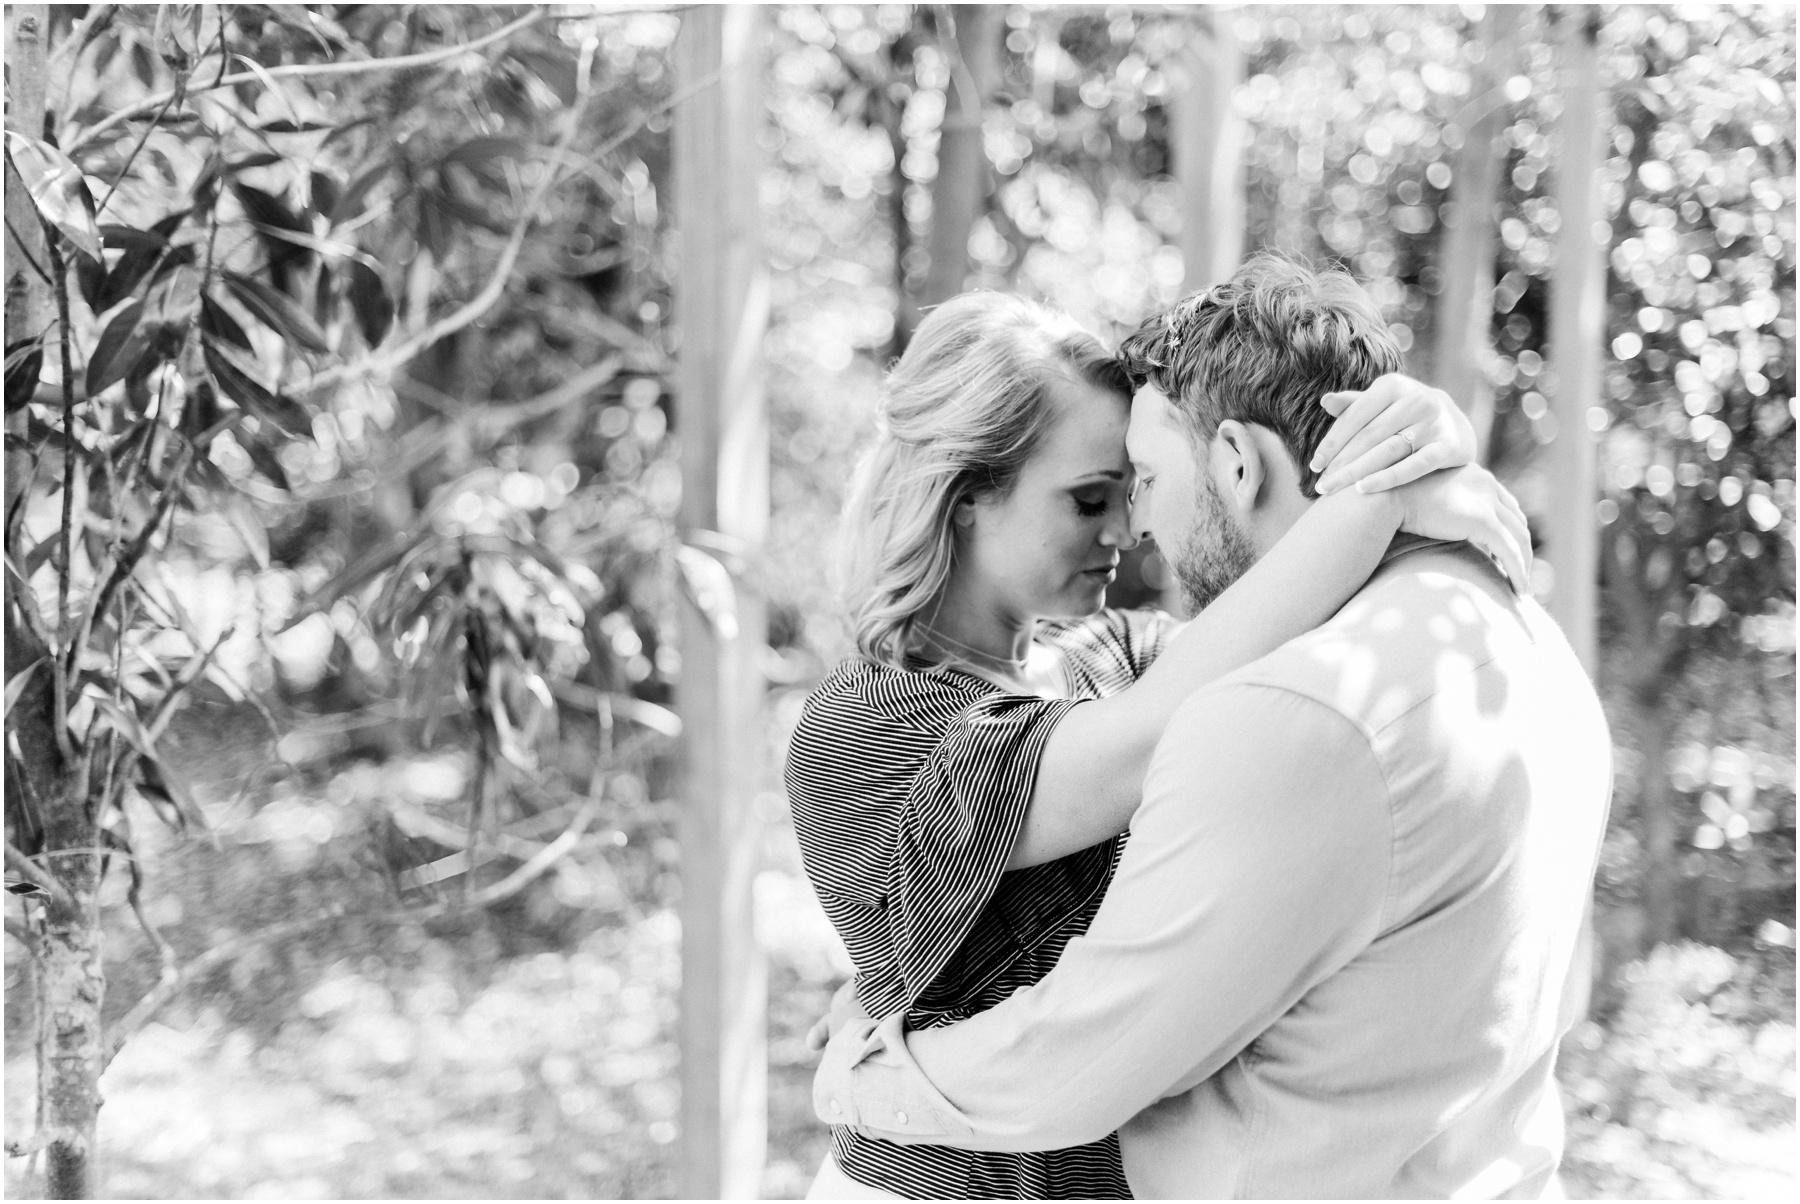 Mepkin-Abbey-Moncks-Corner-South-Carolina-Engagement-Session-Photos_0014.jpg